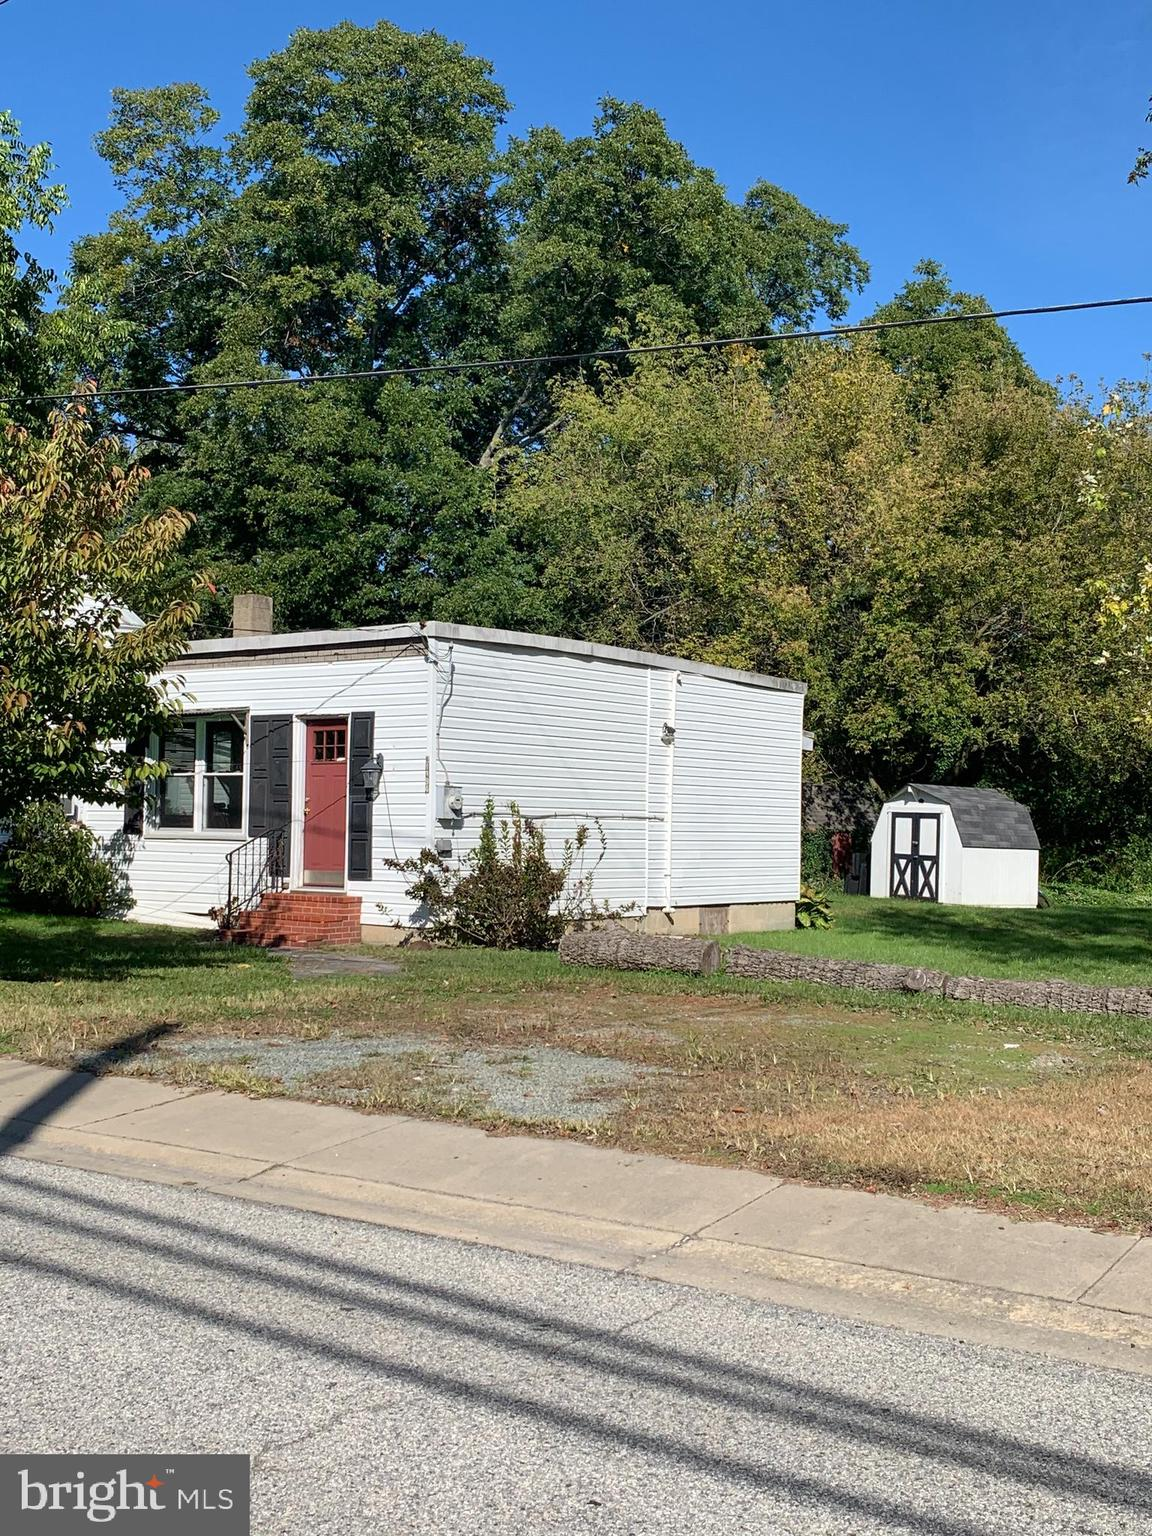 21394 SHARP STREET, ROCK HALL, Maryland 21661, 1 Bedroom Bedrooms, ,1 BathroomBathrooms,Single Family,For Sale,21394 SHARP STREET,MDKE117286